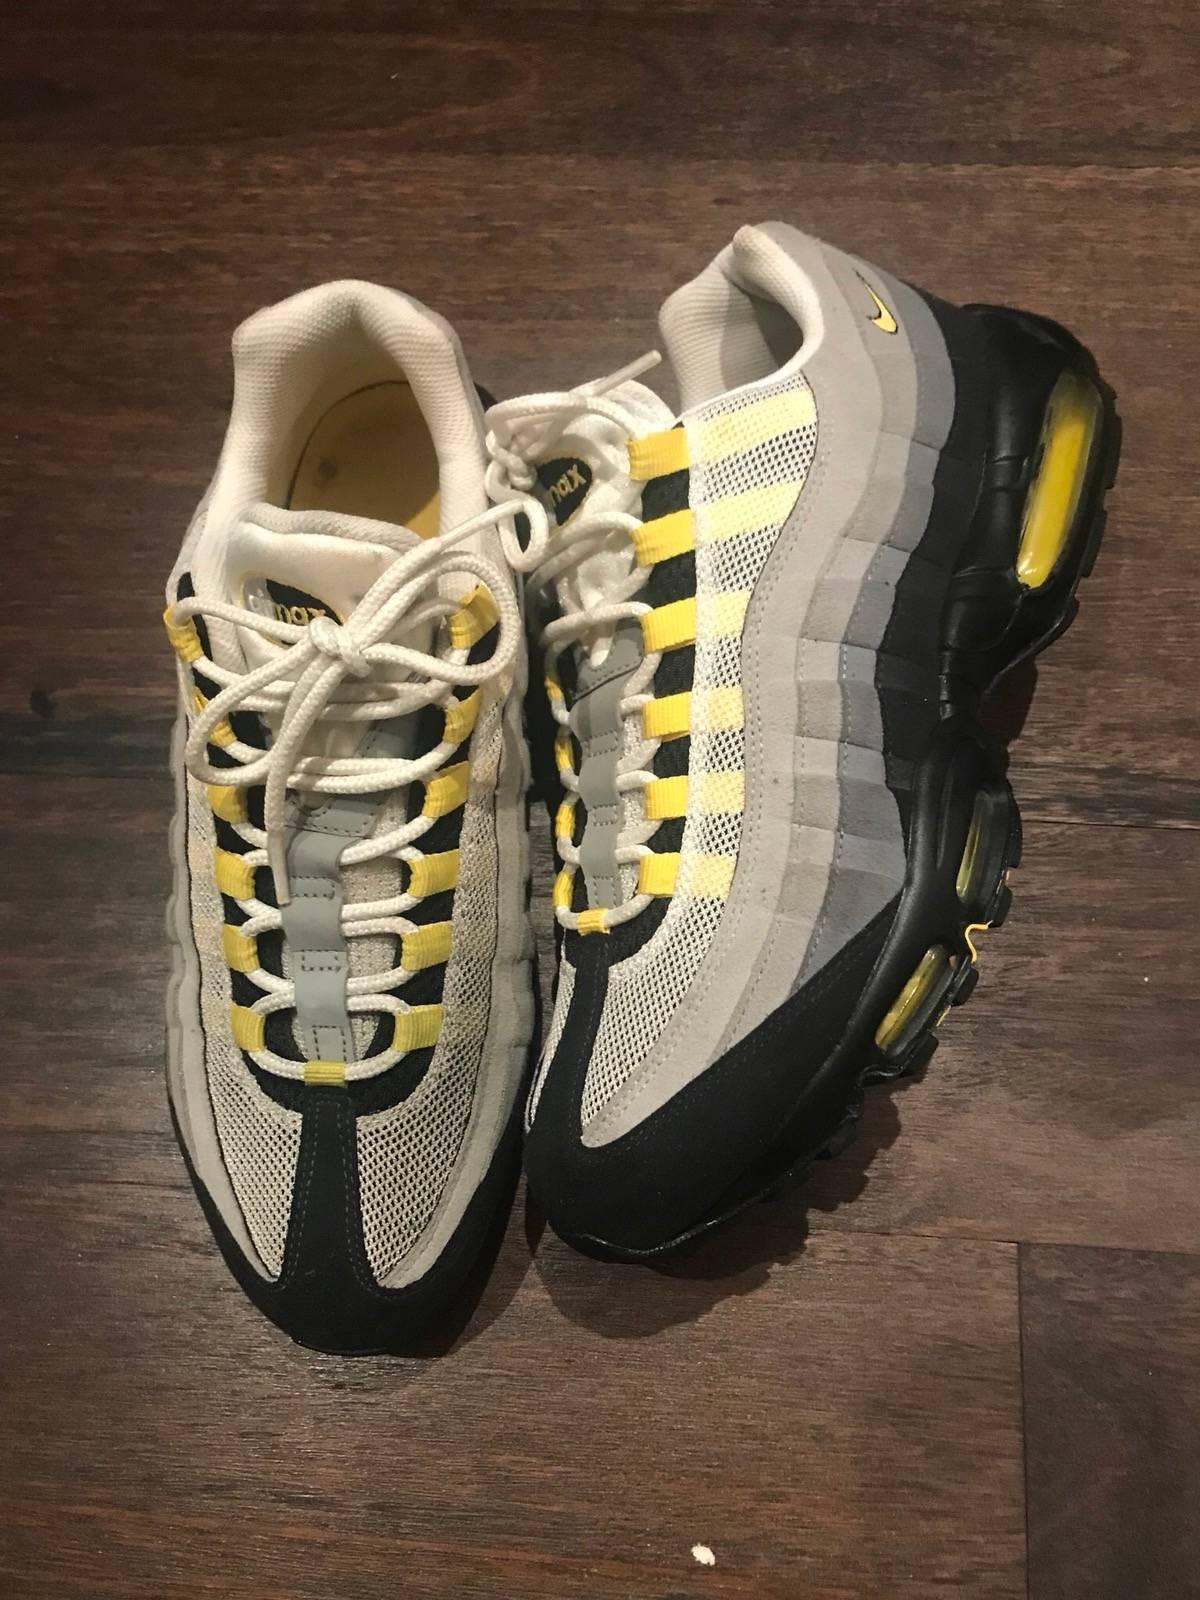 quality design 0d9a7 d9137 Nike Air Max 95 Tour Yellow Size 10.5 $110